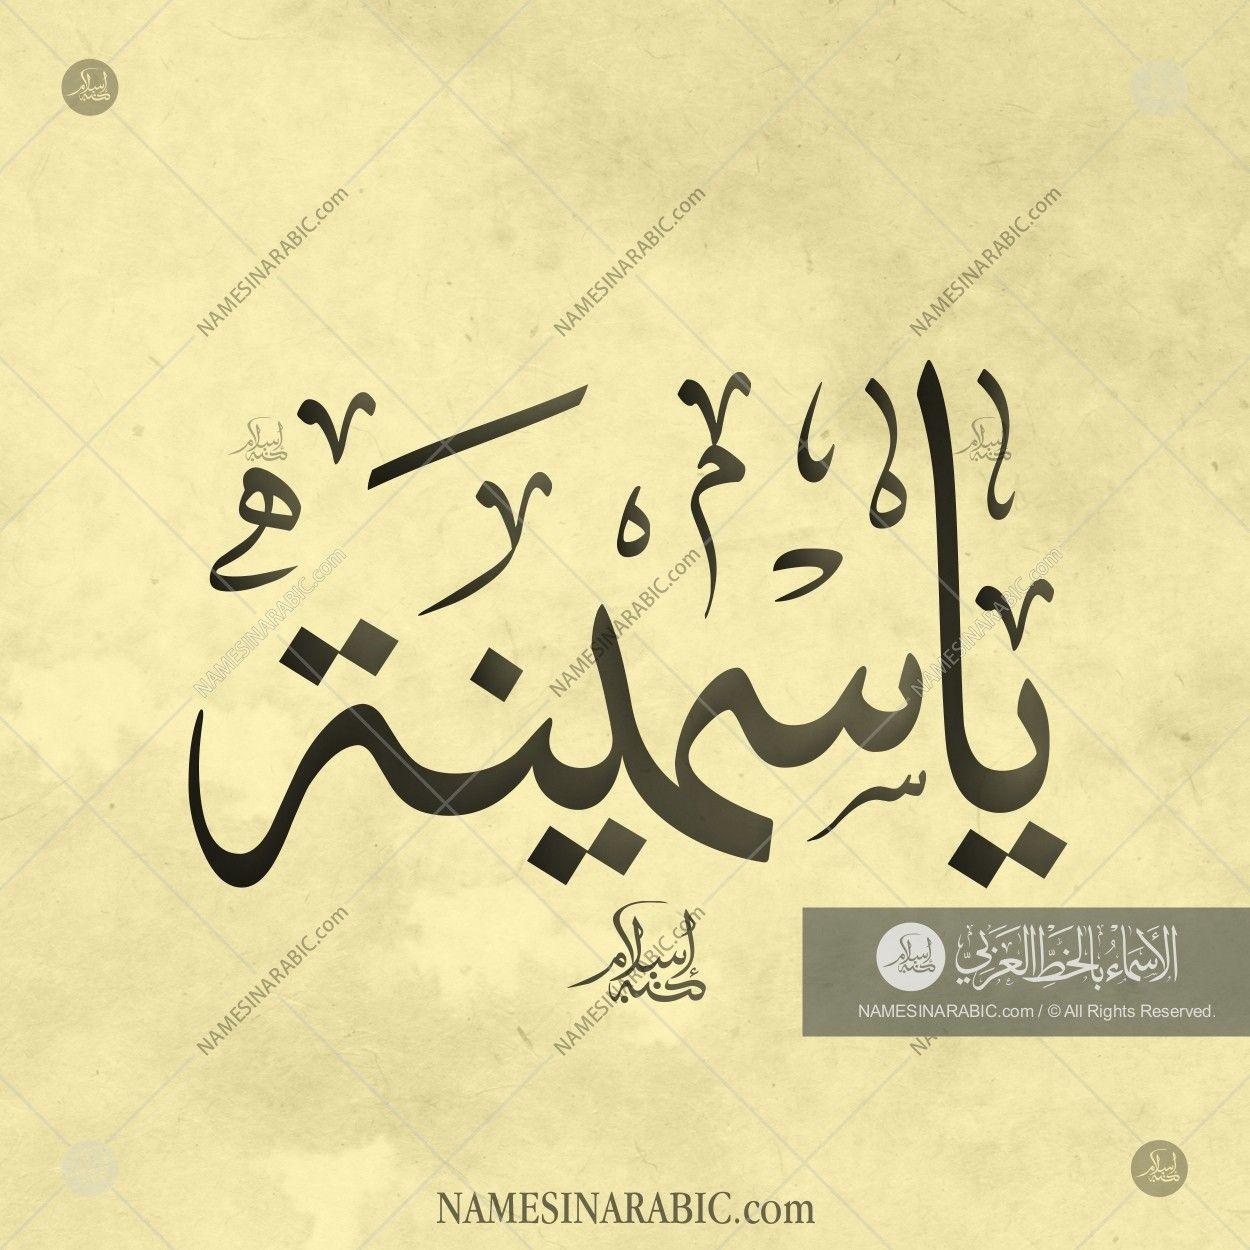 Yasmina ياسمينة Names In Arabic Calligraphy Name 1955 Arabic Calligraphy Islamic Art Calligraphy Calligraphy Name